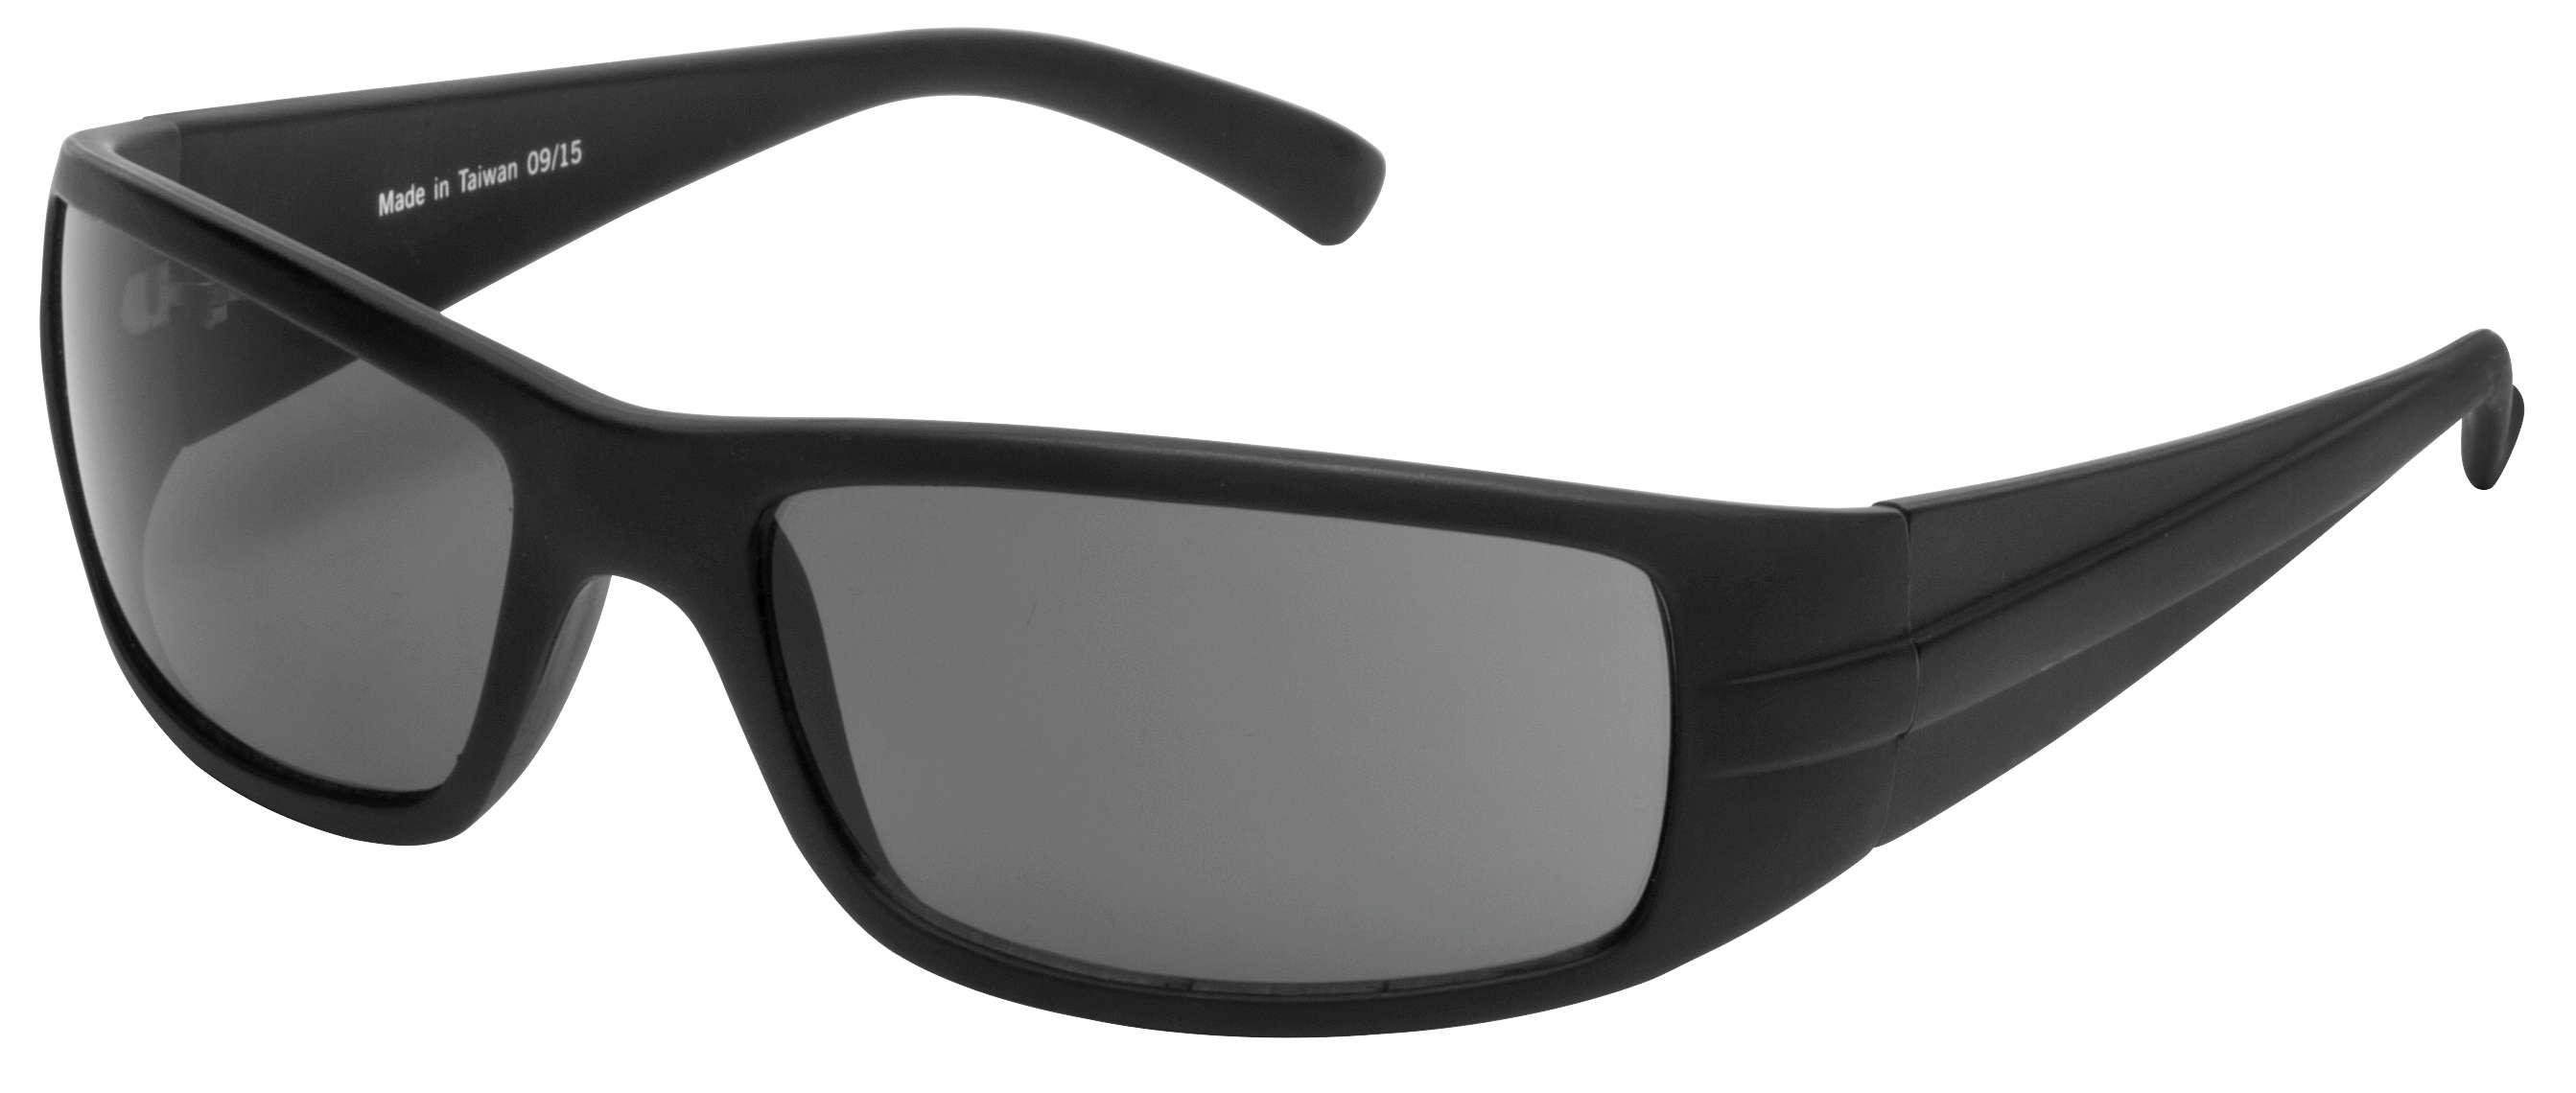 Sicily Sunglasses